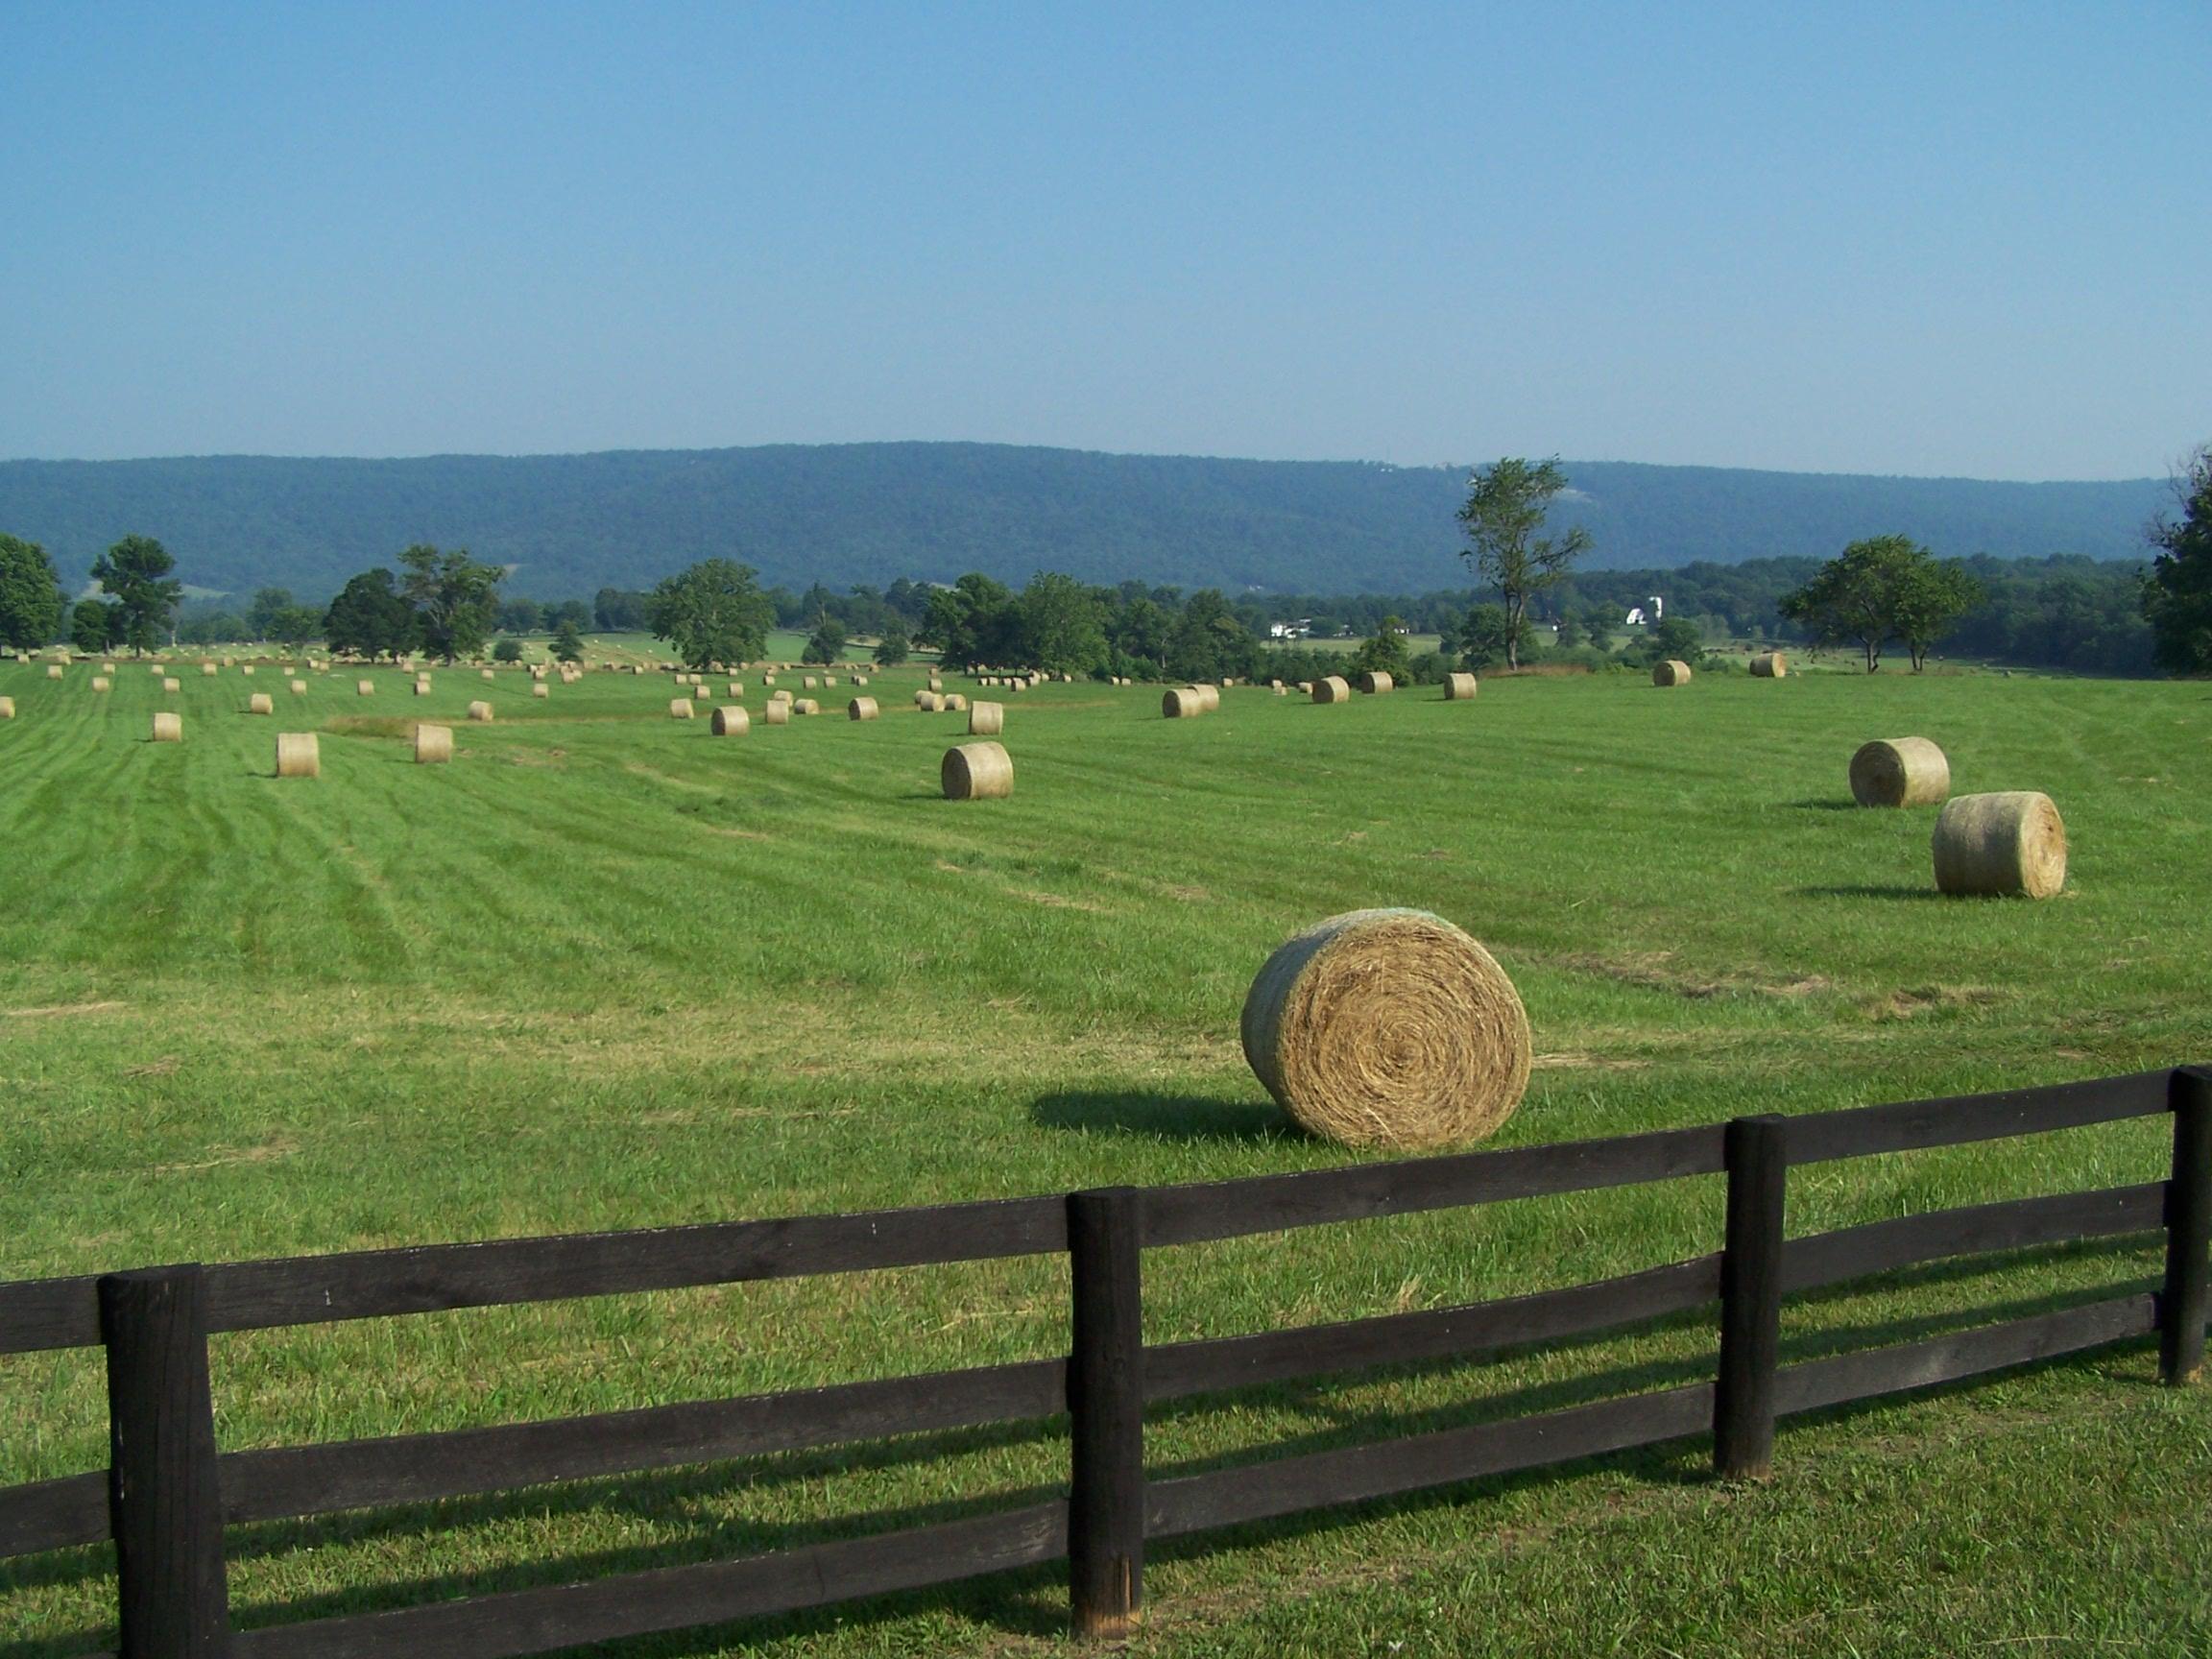 Springtime hay near Blakeley's Grove, Fauquier County.